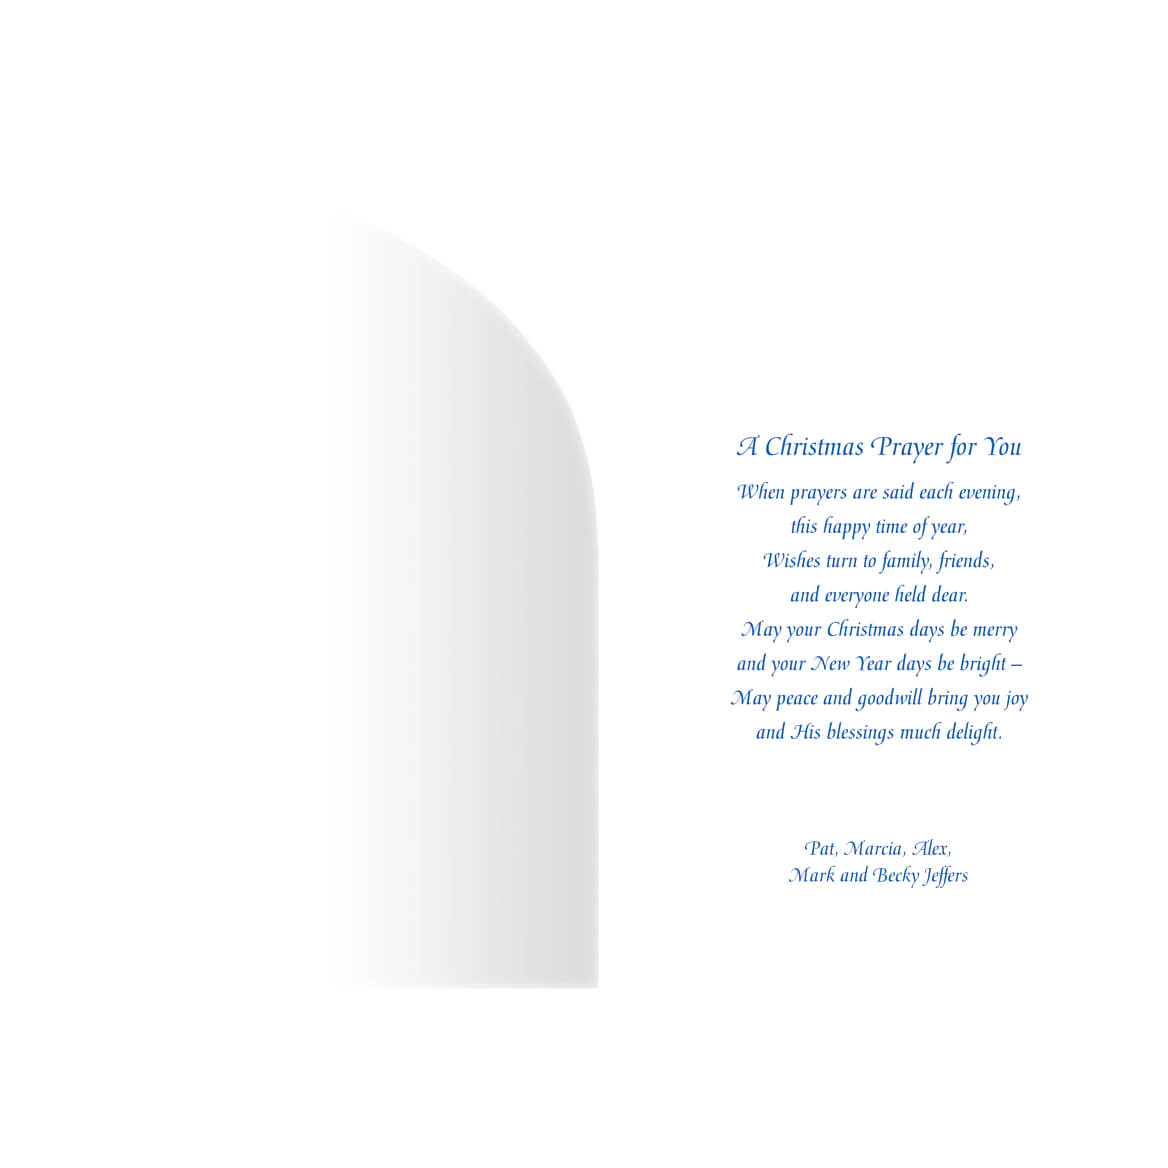 Personalized Christmas Prayer Card Set of 20 - Miles Kimball